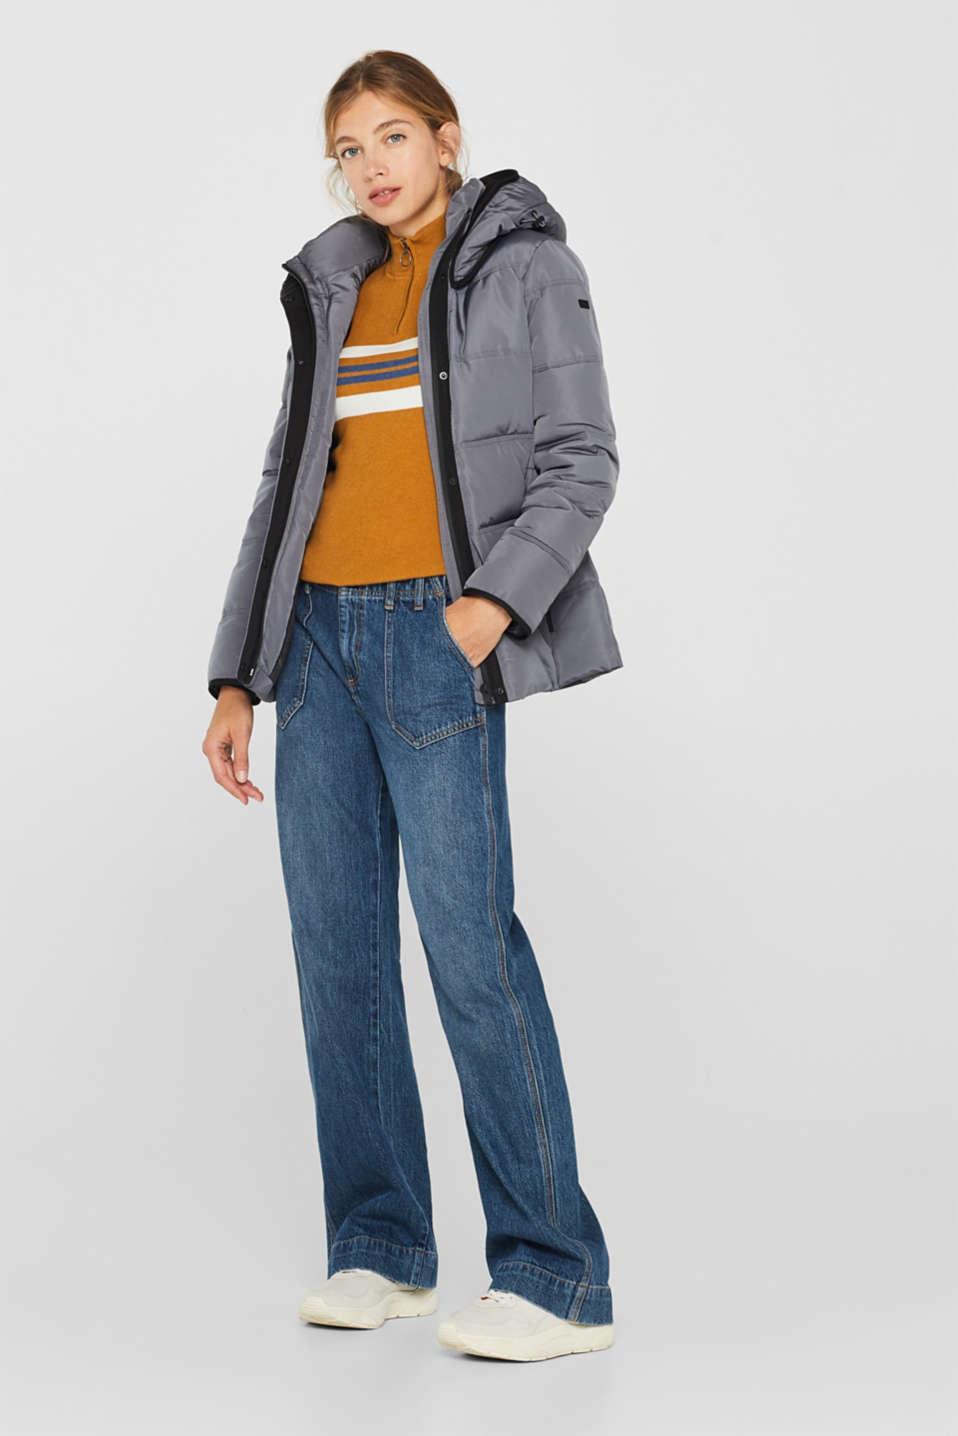 Jackets outdoor woven, DARK GREY, detail image number 1